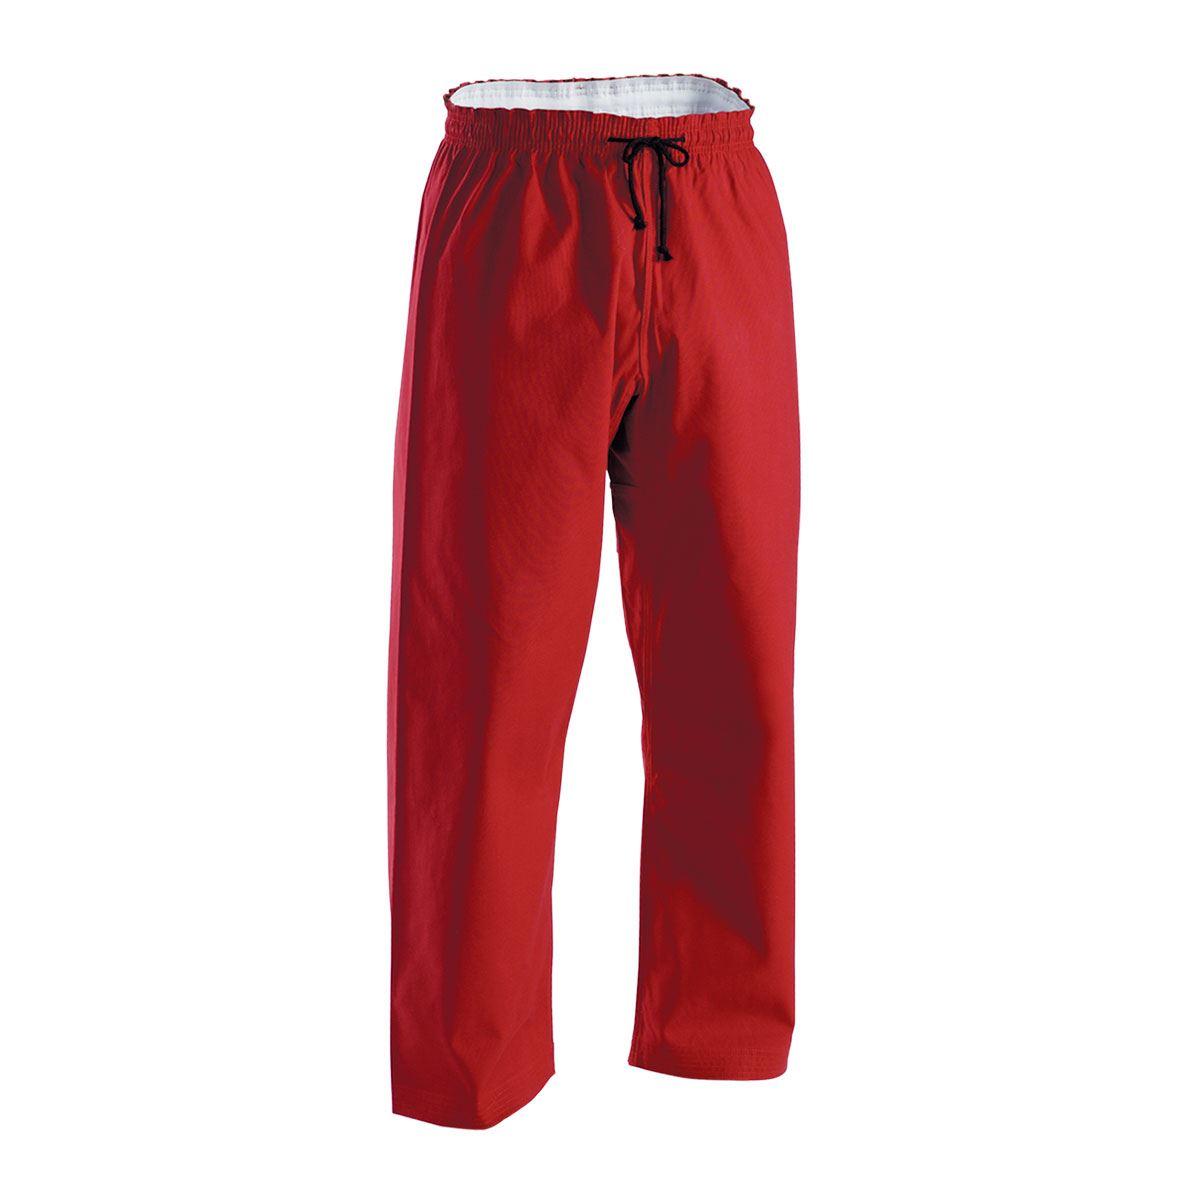 Red Brushed Cotton Elastic Waist Karate Pants